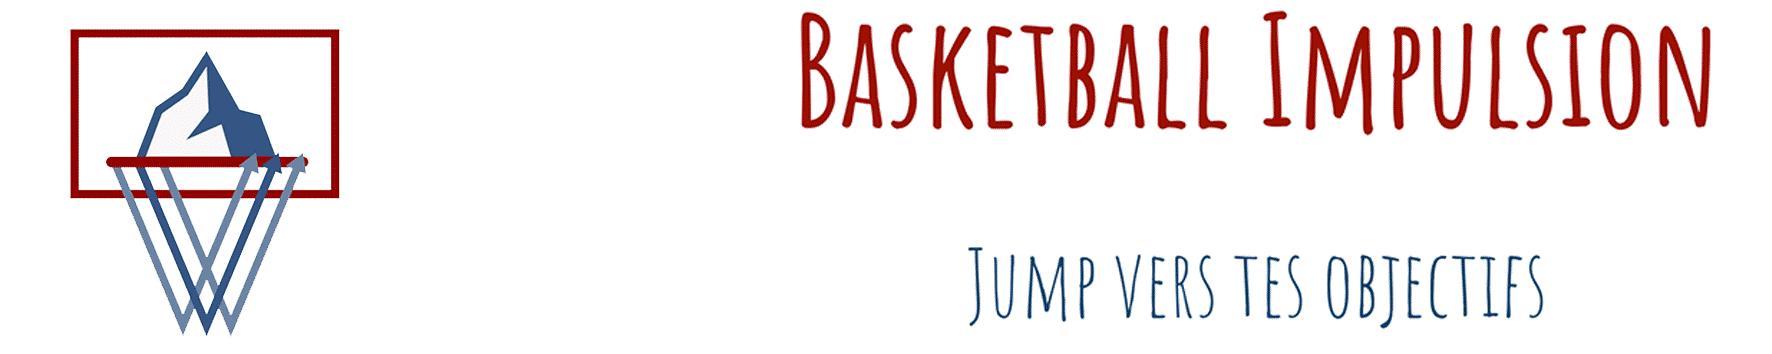 Basketball Impulsion